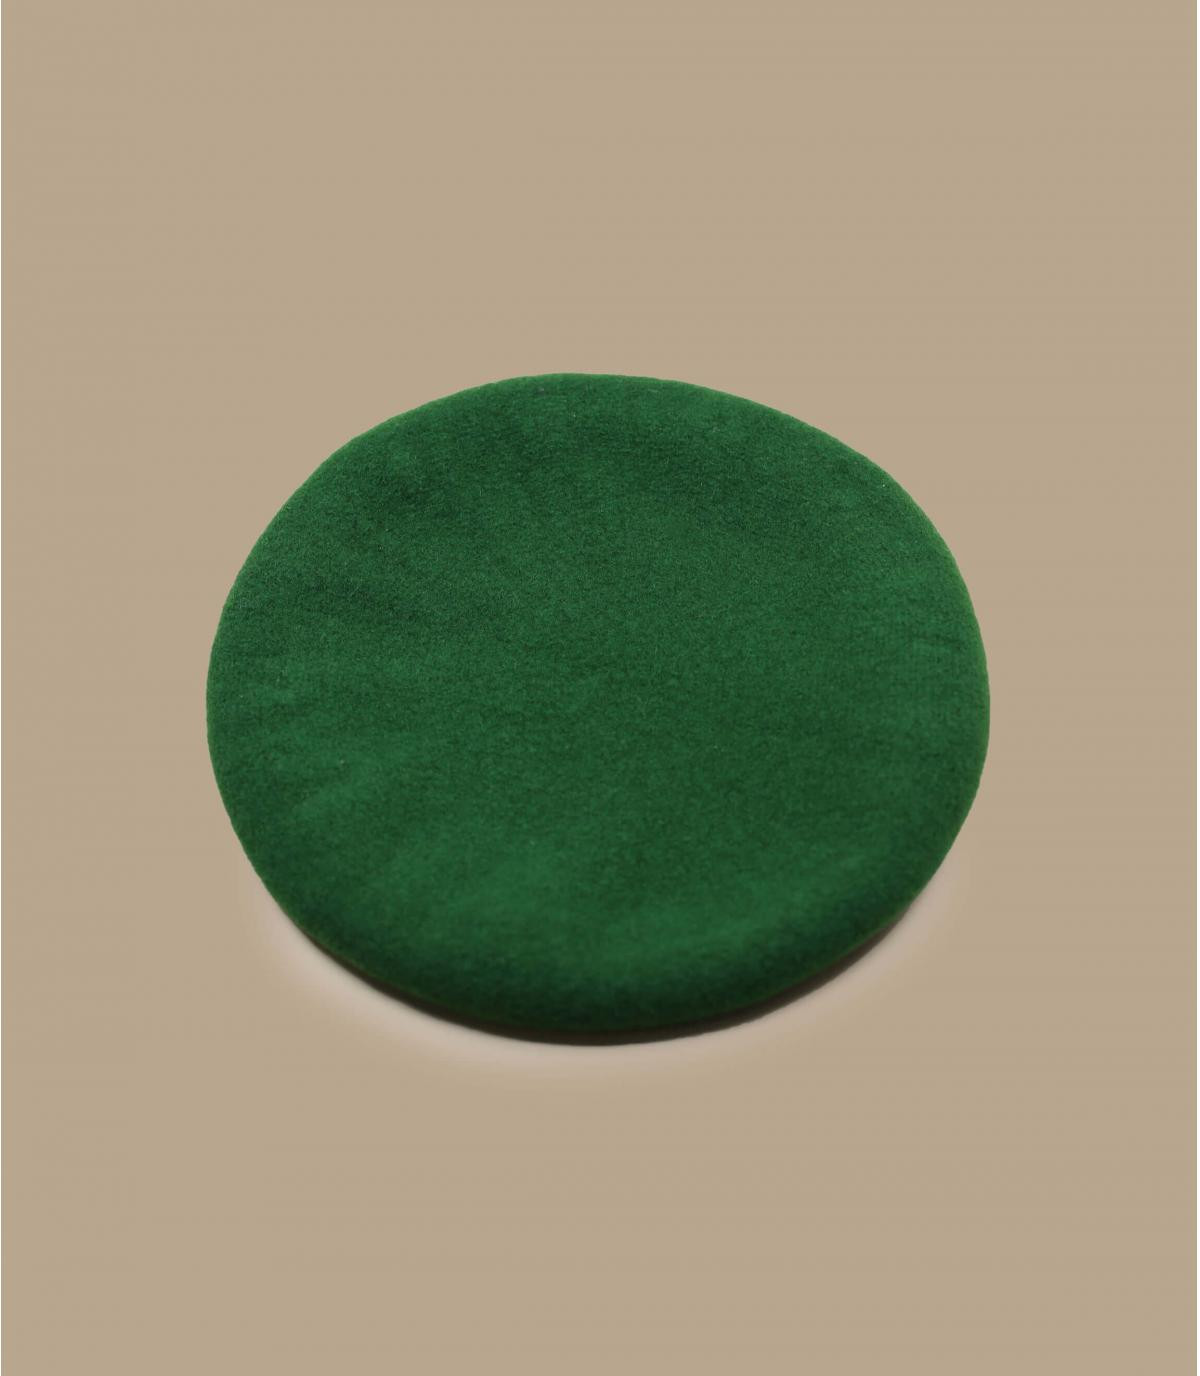 Details Béret Commando army green - afbeeling 2